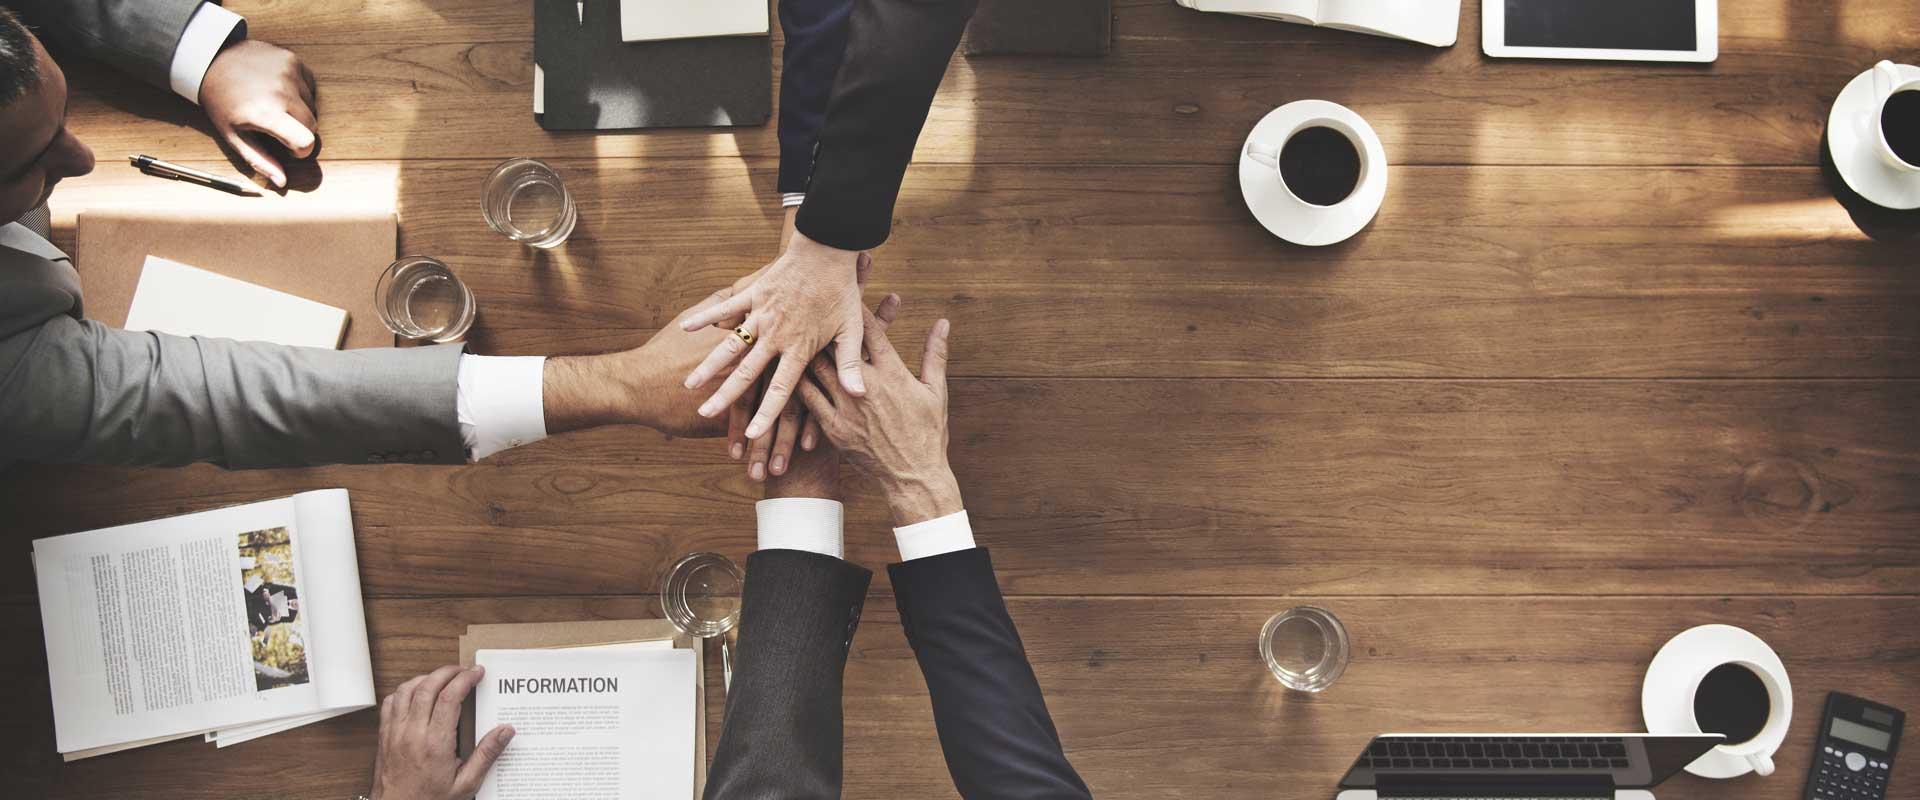 lars halskov - kommerciel forretningsudvikling, brand & konceptudvikling, kommunikation & markedsføring, partner